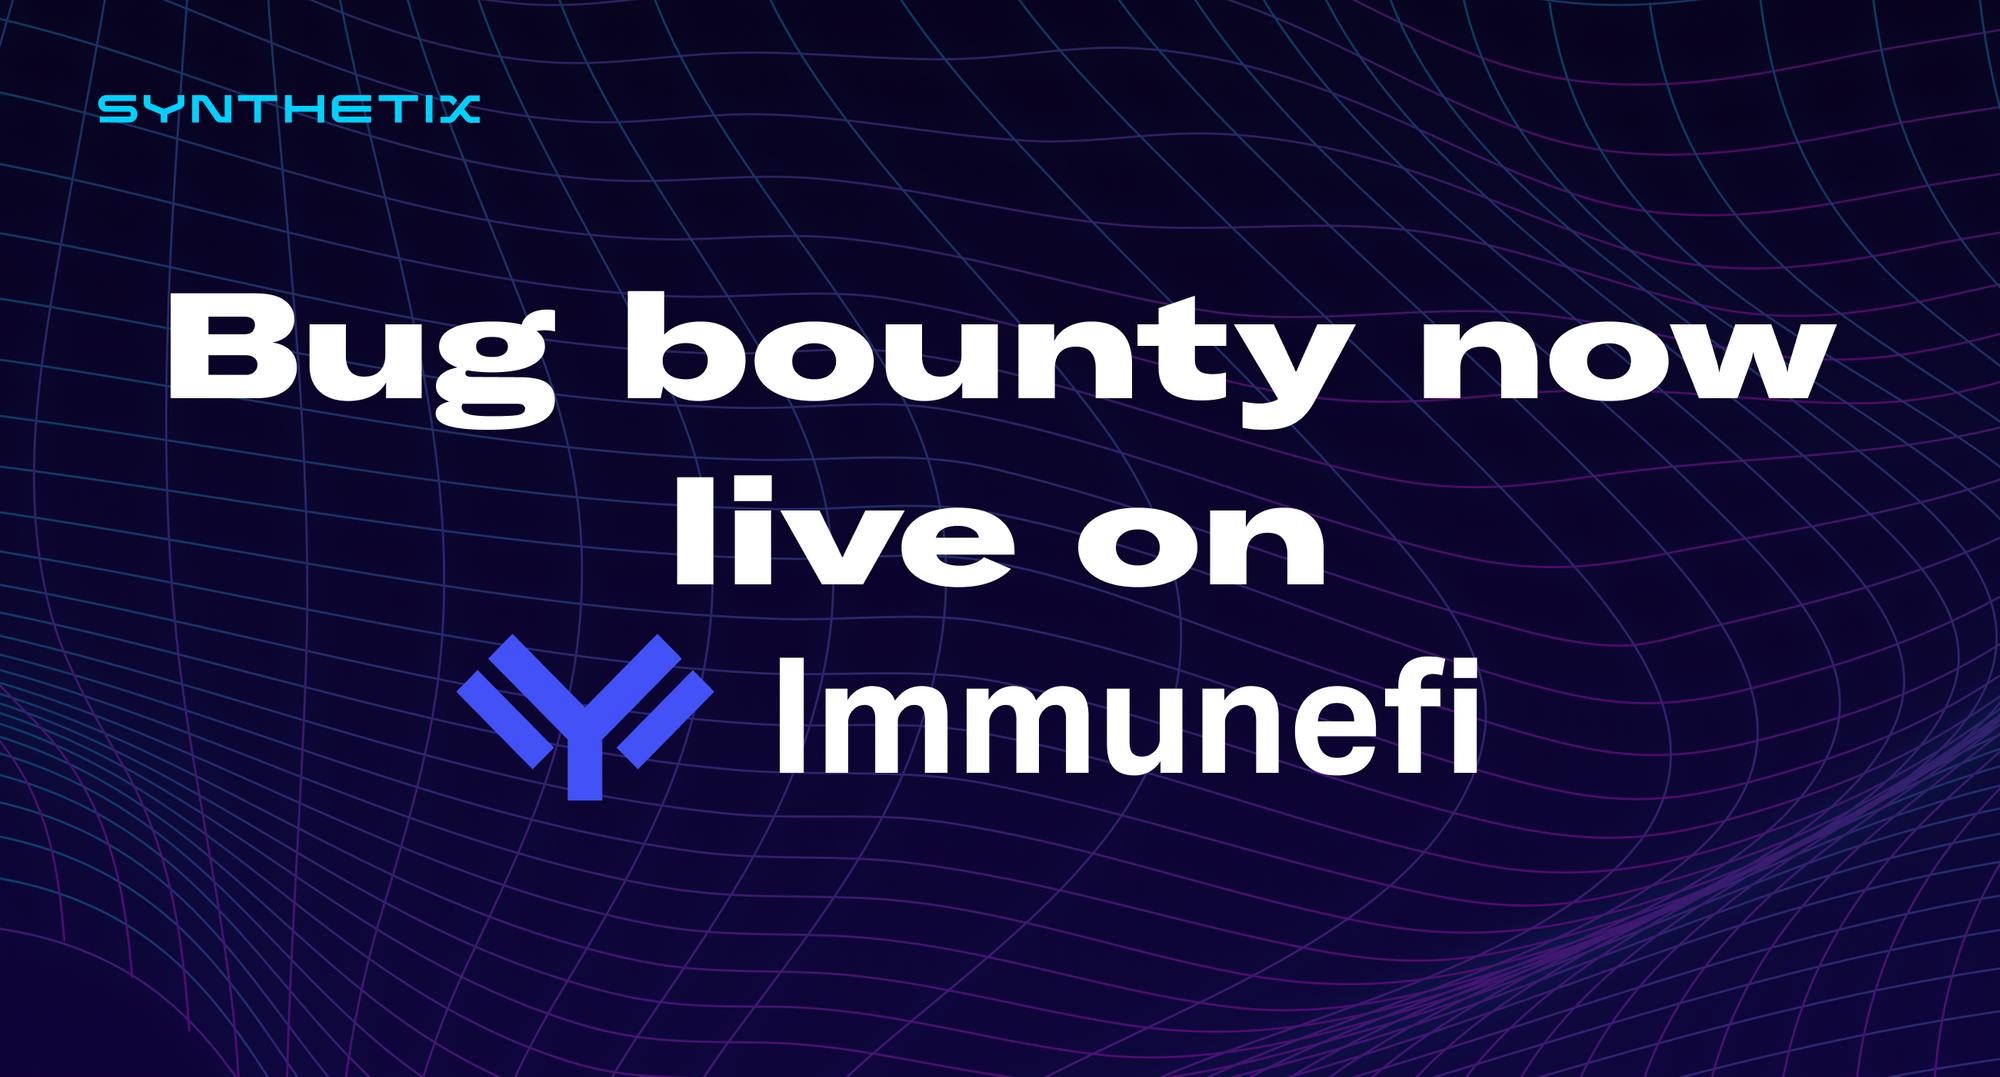 Synthetix bug bounty now live on Immunefi